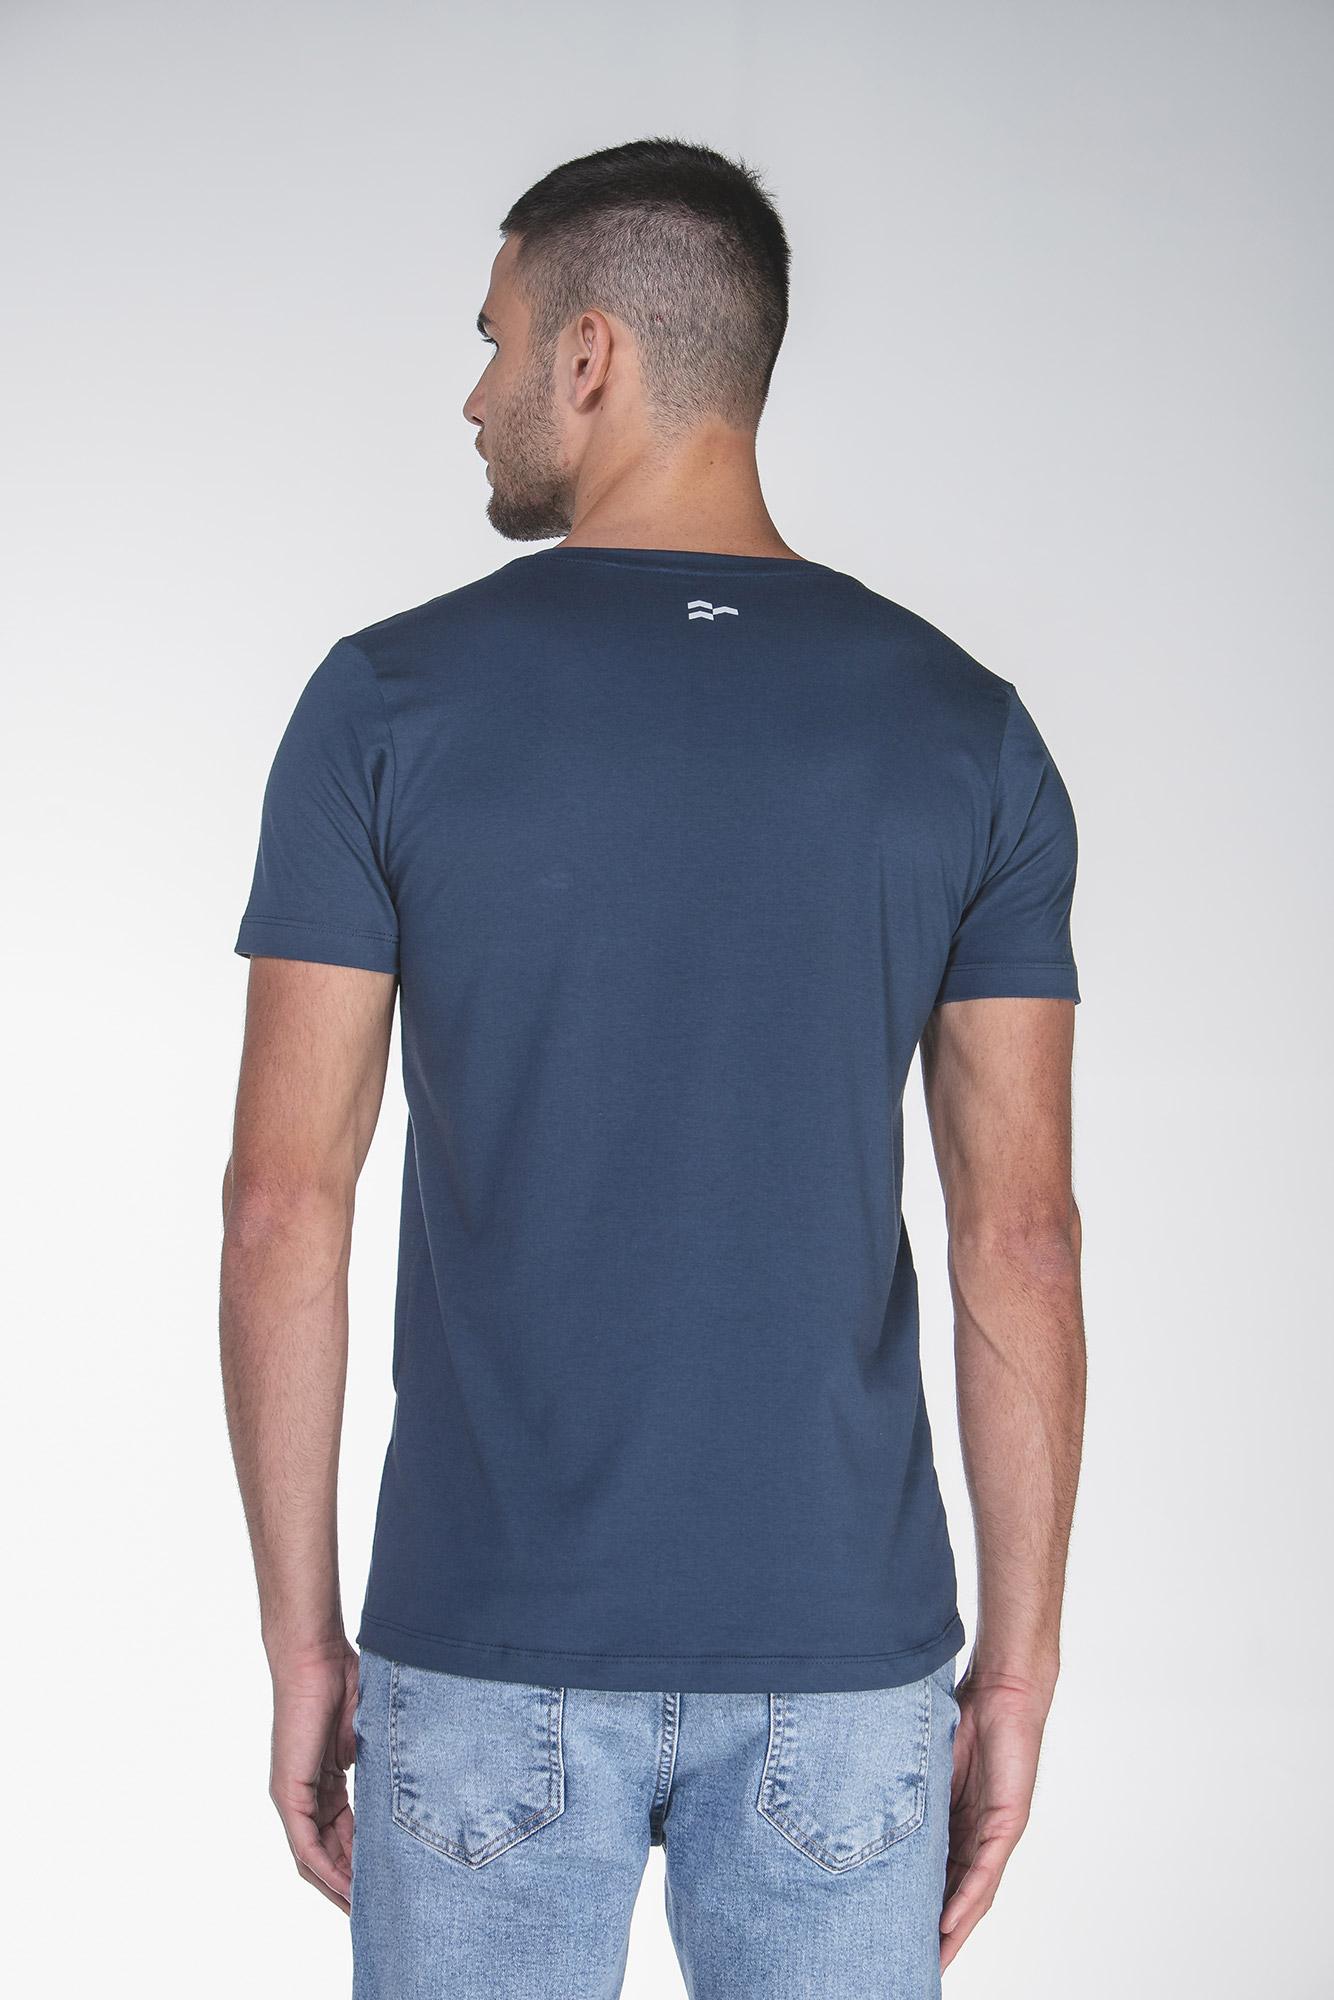 Camiseta Basic Egypt Azul/Branco